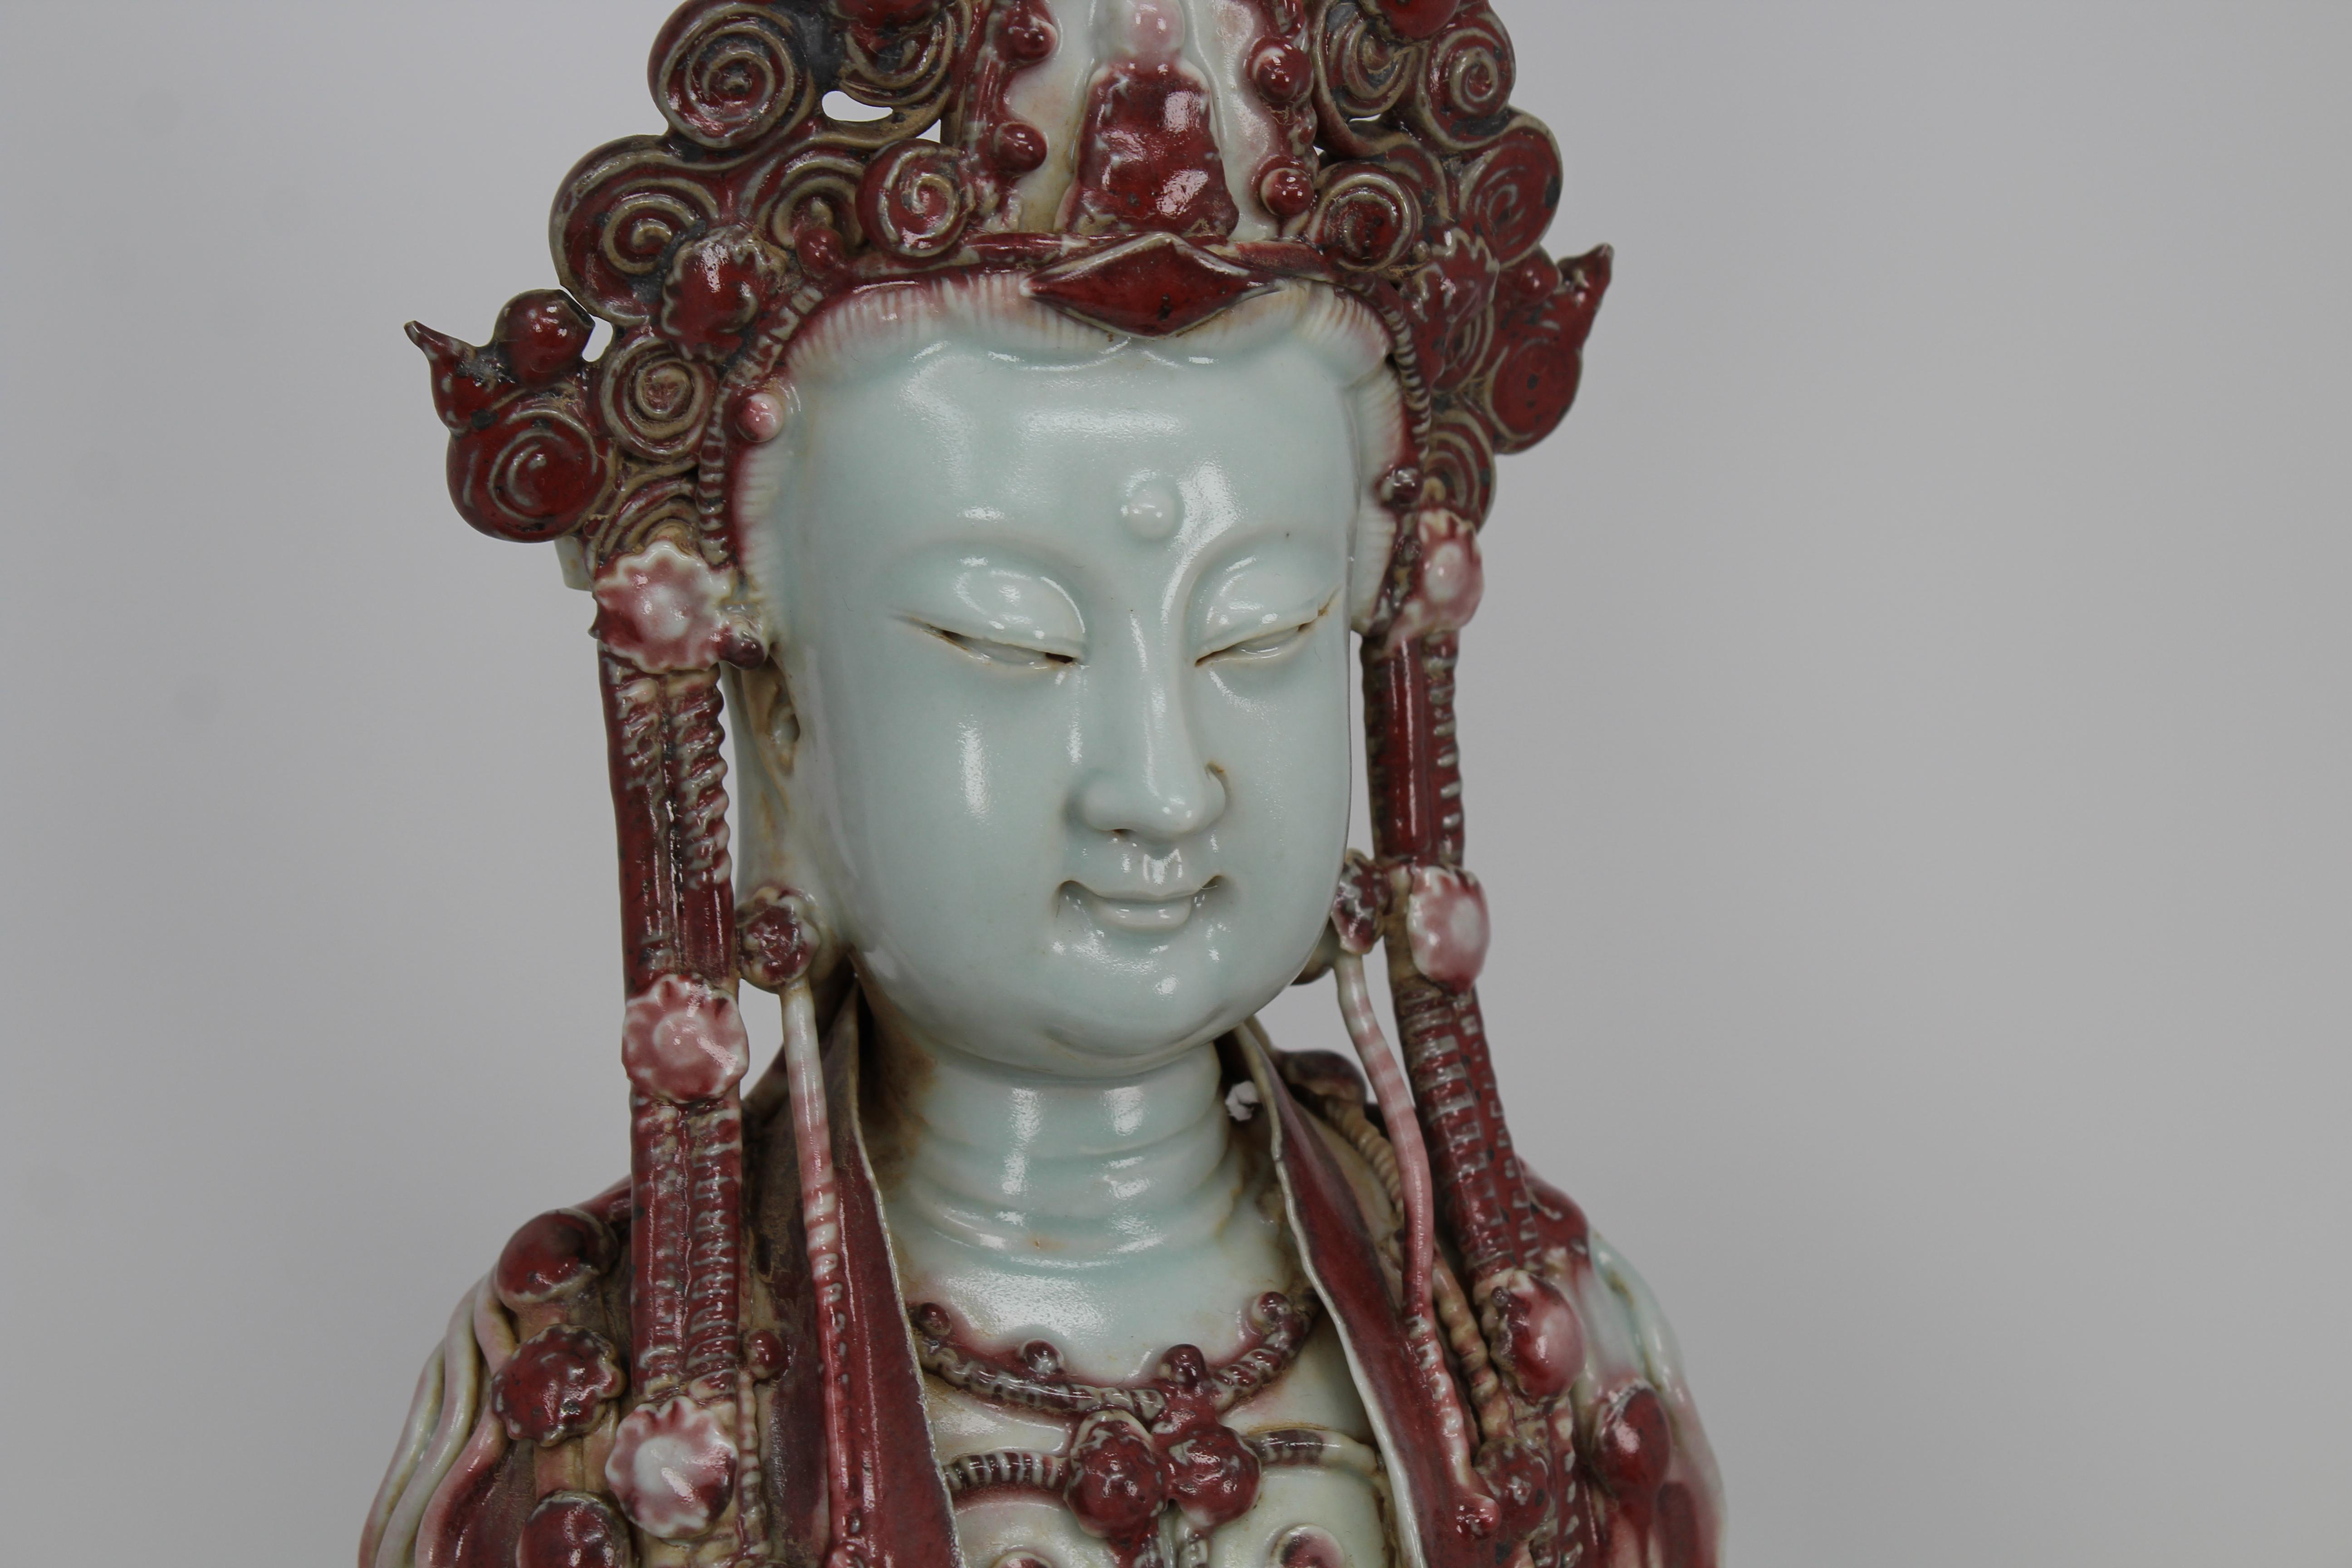 Lot 27 - Large Antique Chinese Longquan Glazed Guanyin